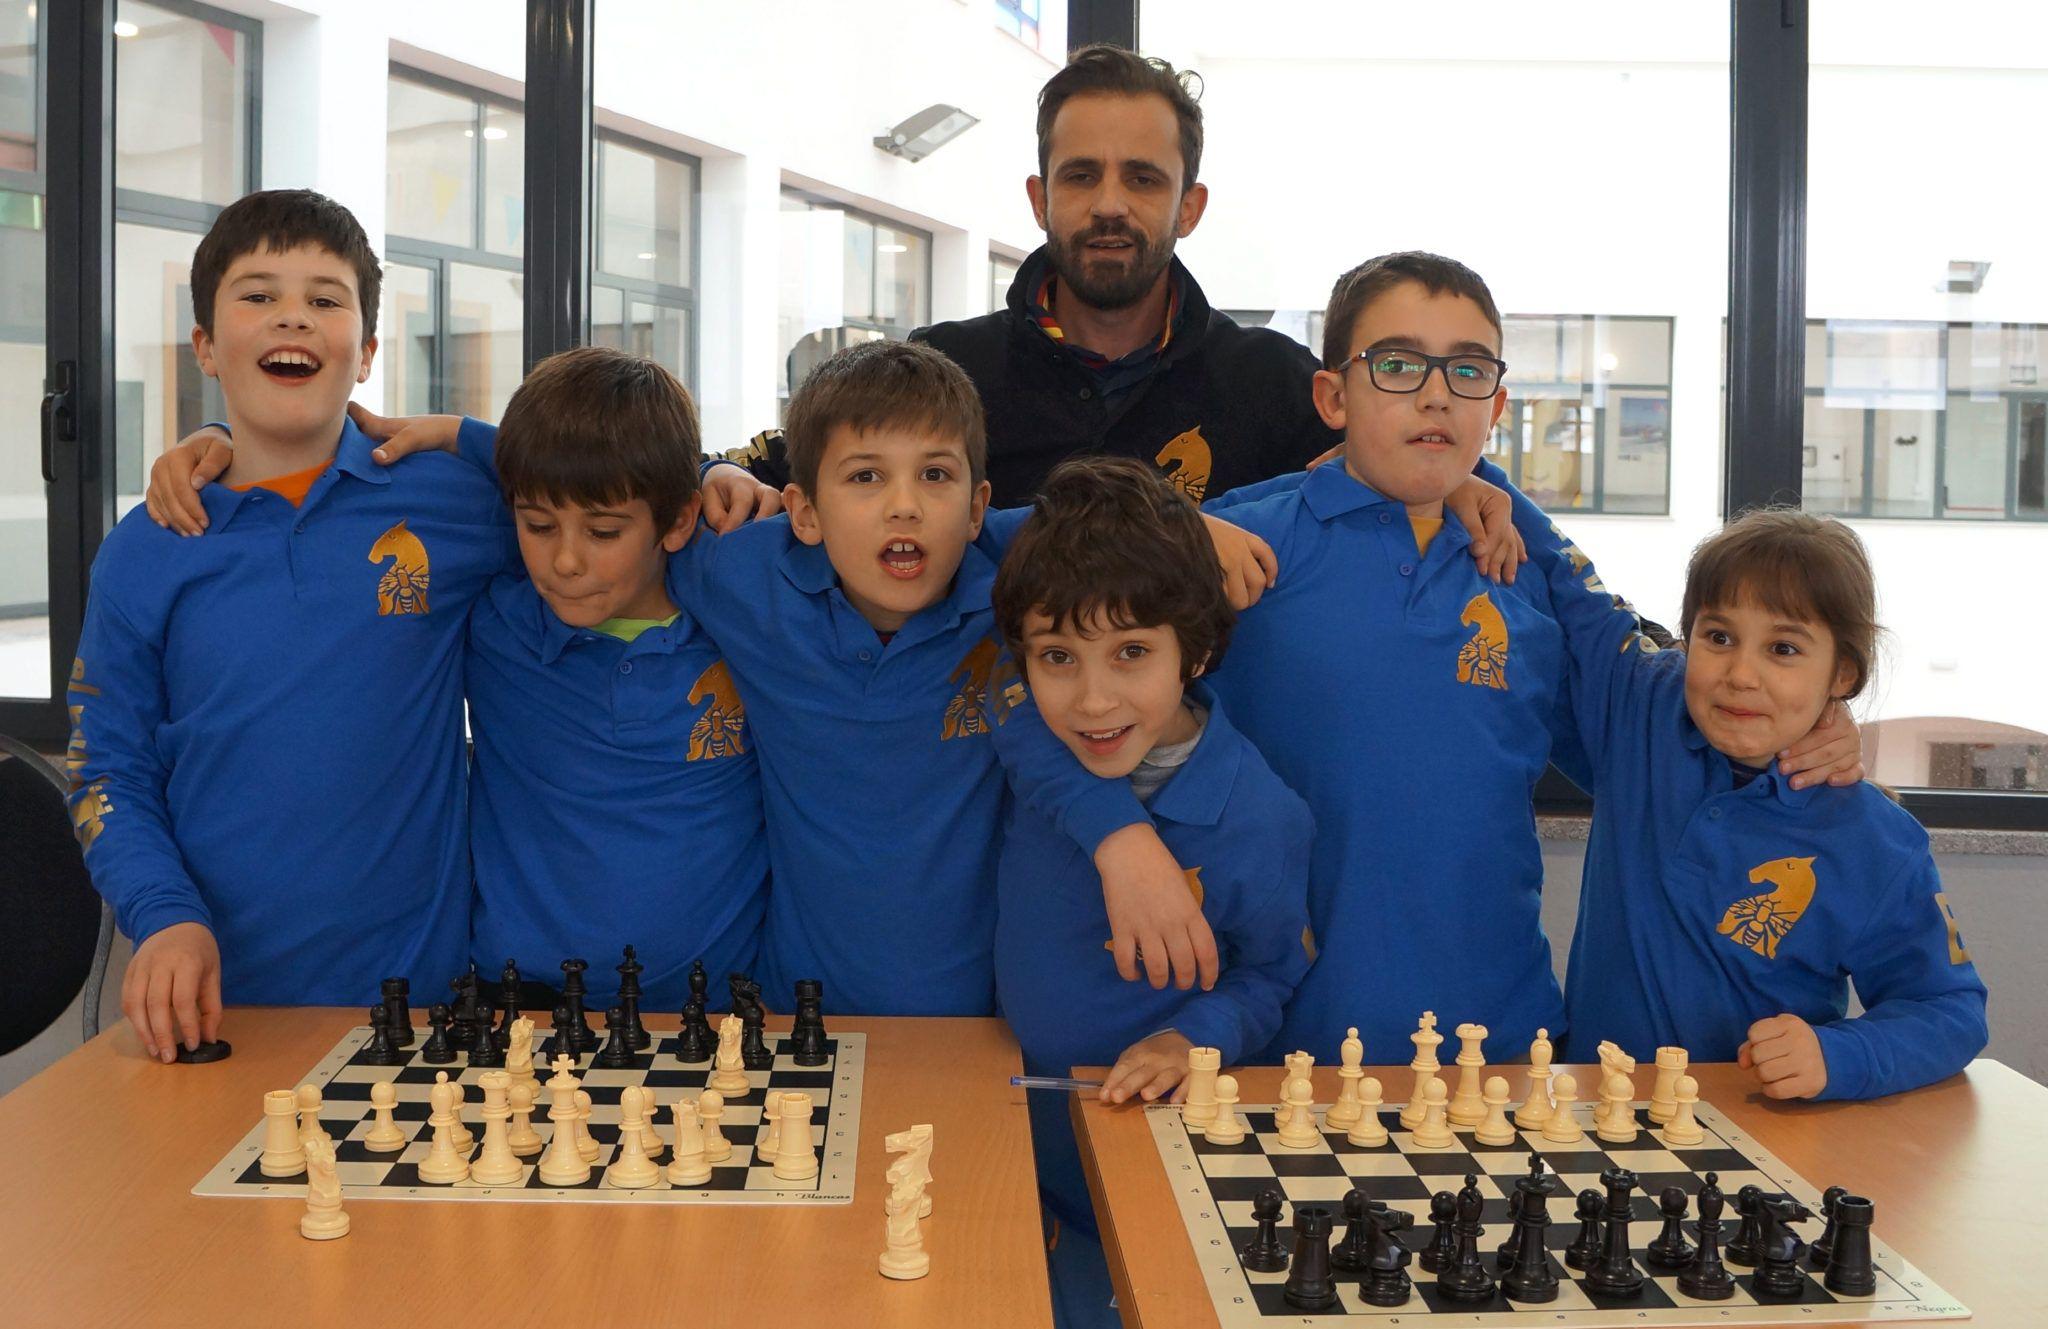 escuela municipal de ajedrez del Club Ajedrez Béjar